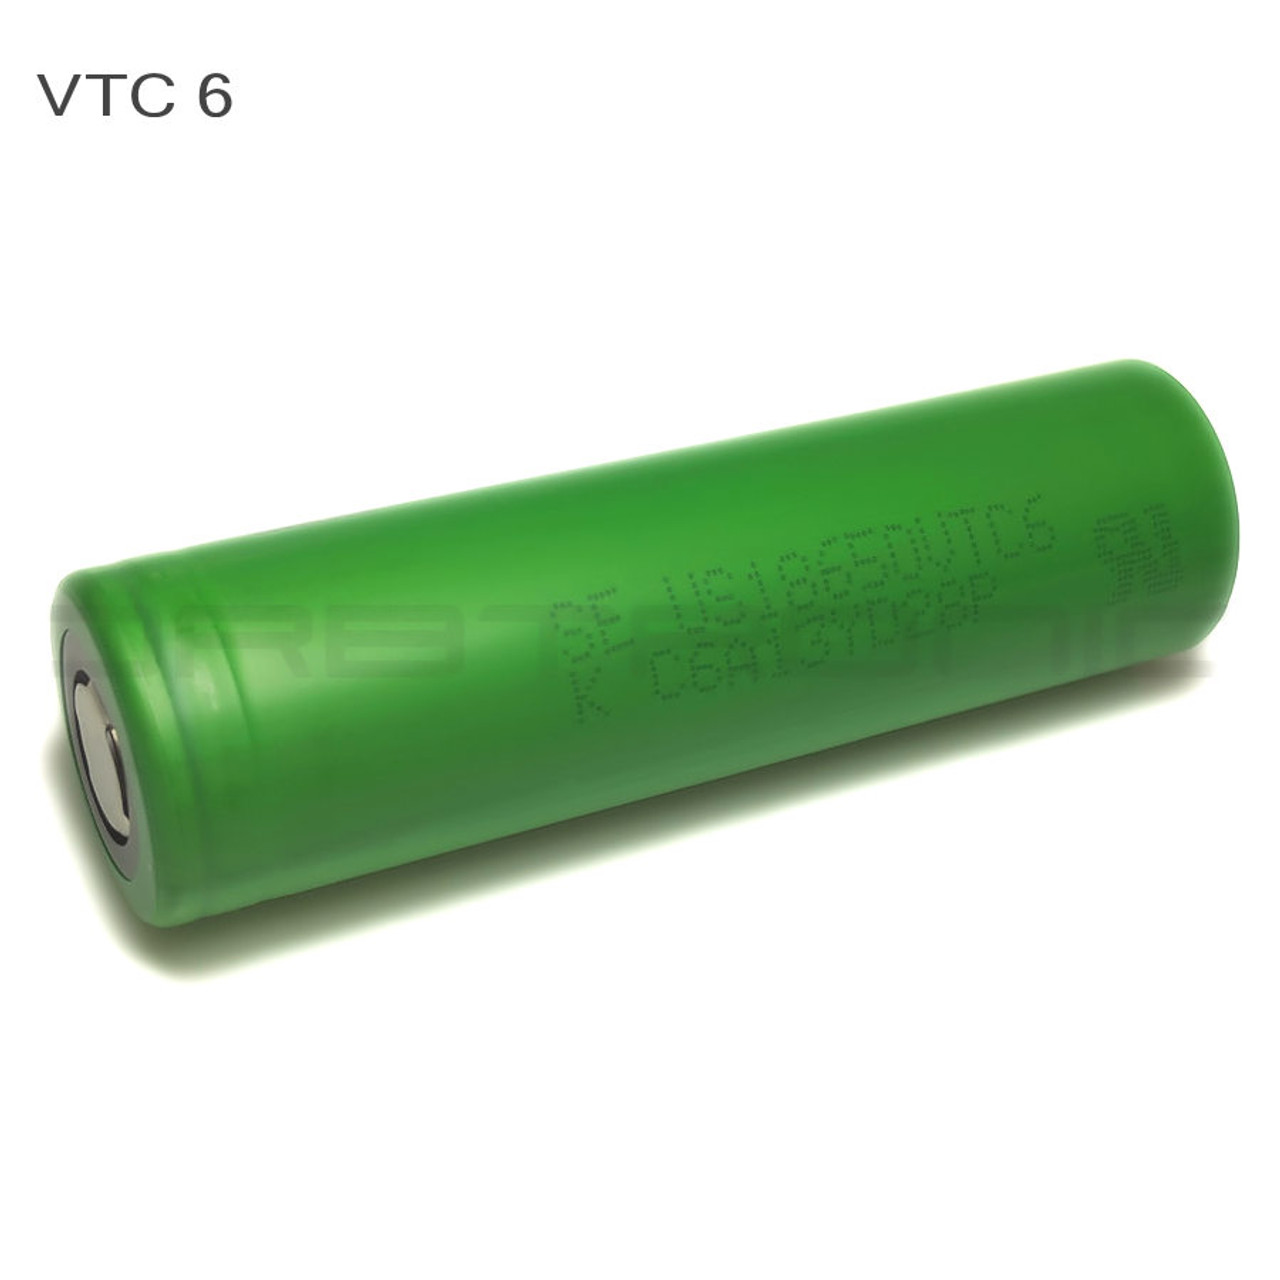 Sony VTC6 18650 Battery 3000mAh Flat Top US18650VTC6 IMR High Current-Drain  Li-ion 3 7V